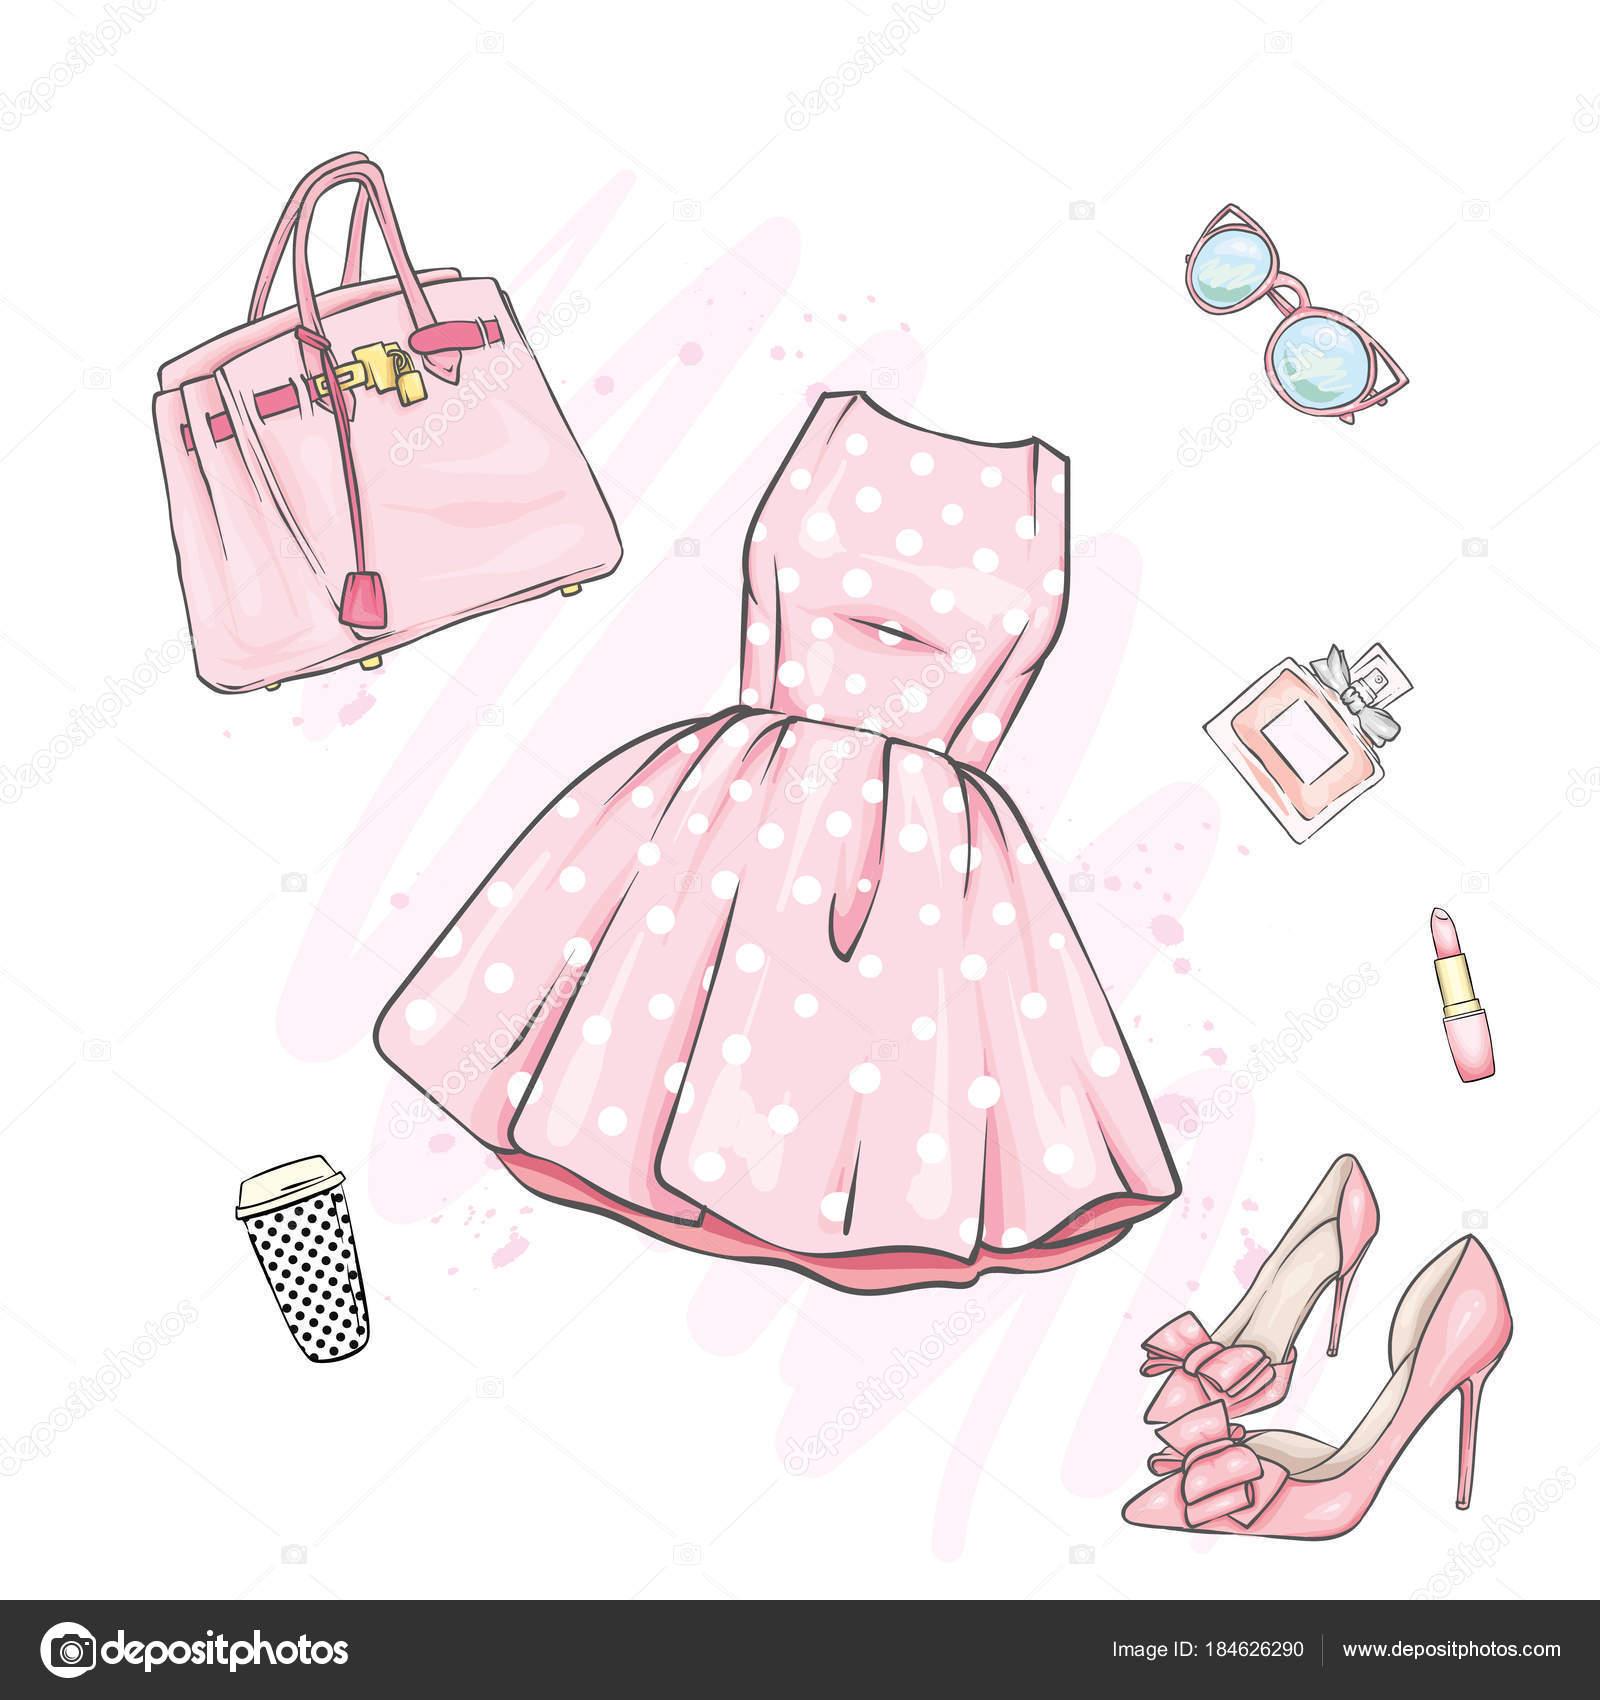 Zapatos Lapiz MujerConjunto Ropa Accesorios De DibujosA 29IHDWE